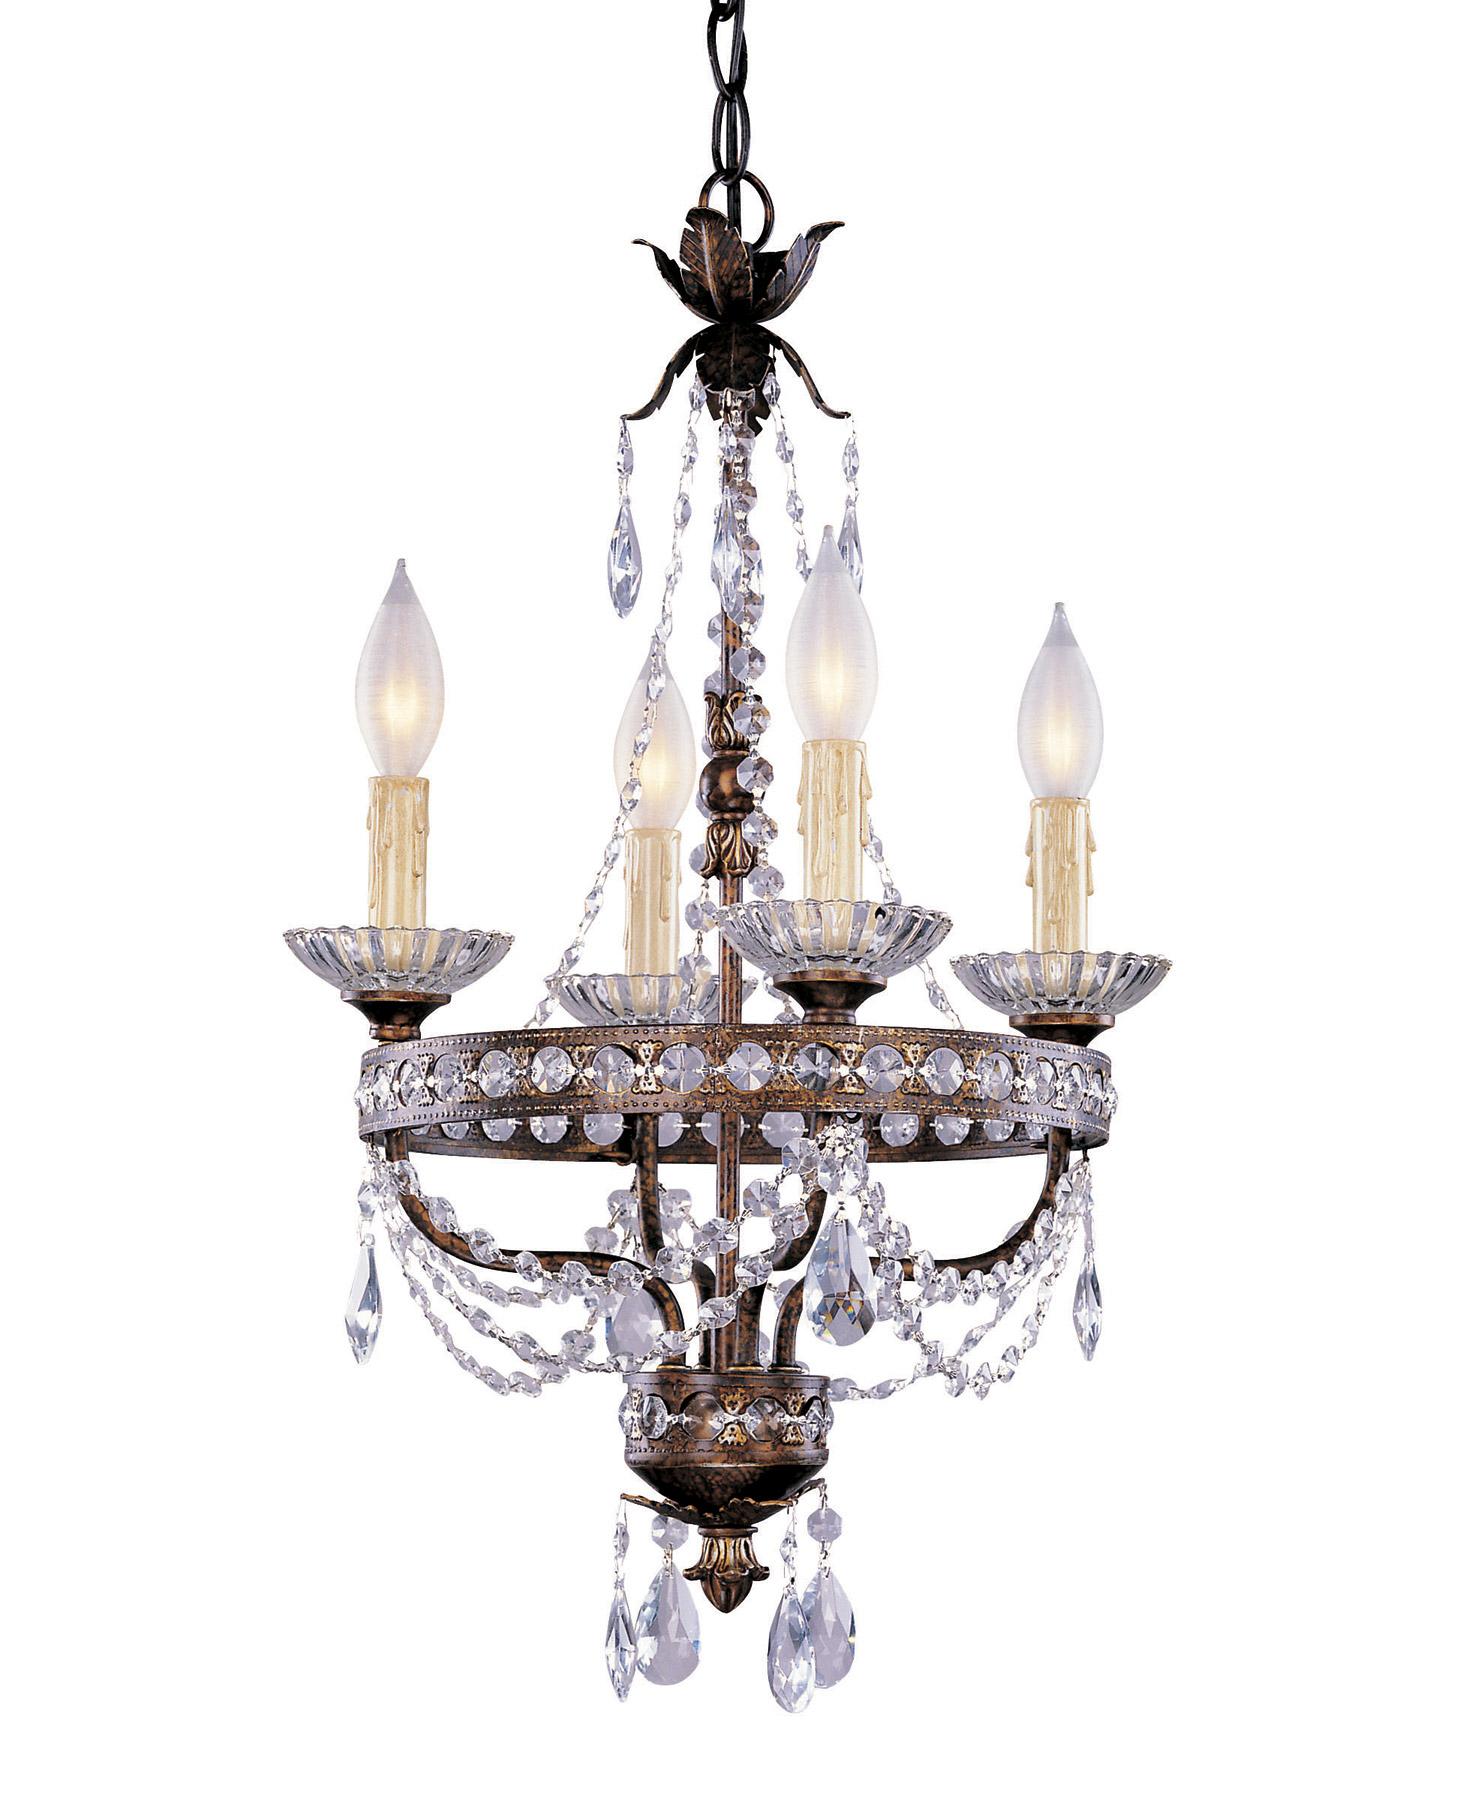 Foyer Mini Chandelier : Savoy house crystal linda mini chandelier